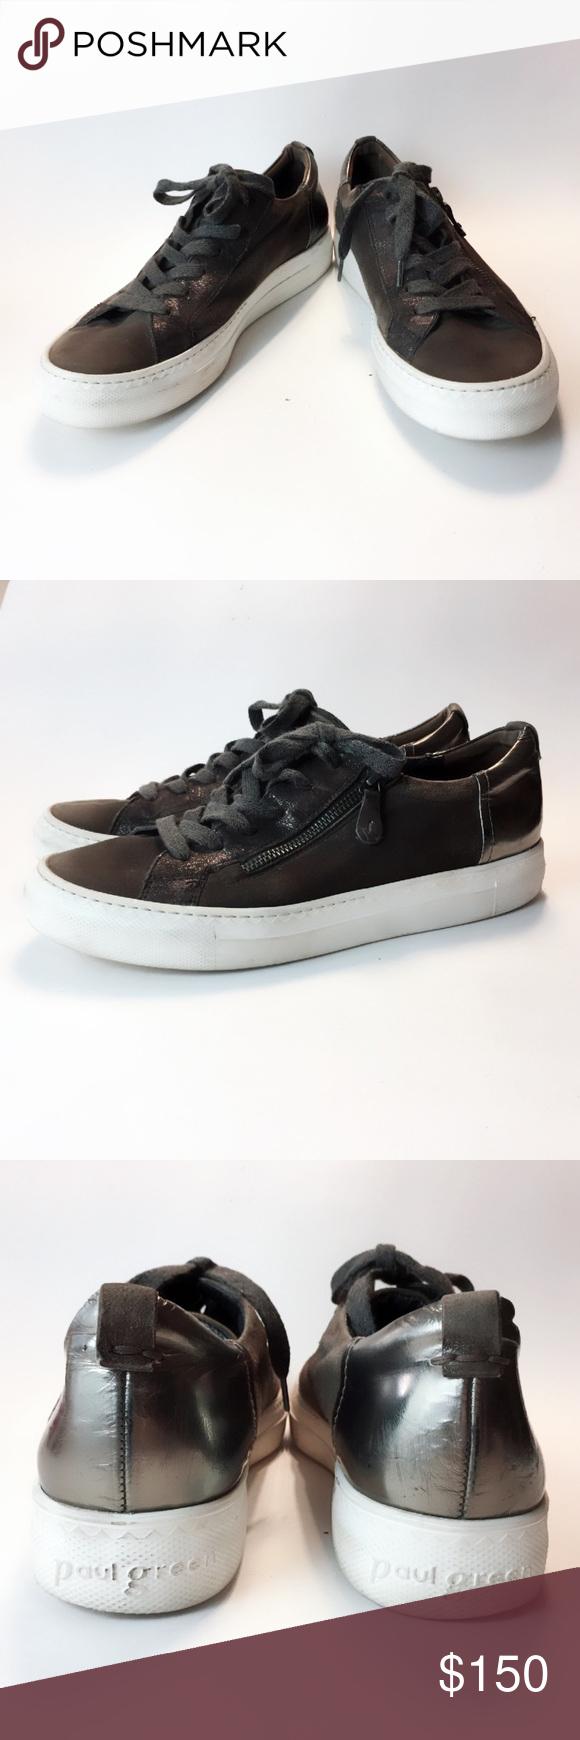 Paul Green Gray Toby Sneakers Nordstrom